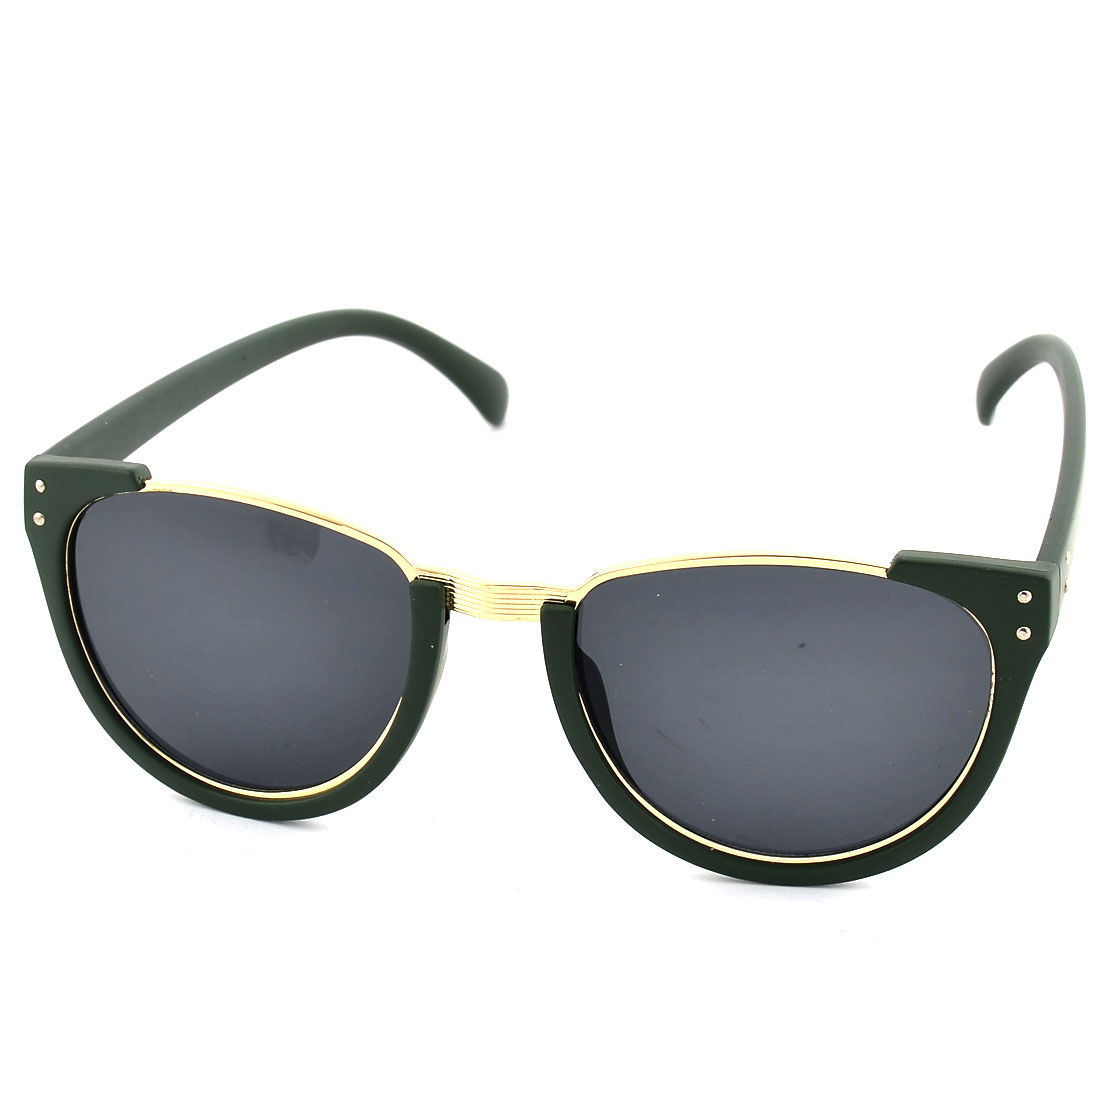 Unisex Single Bridge Lens Outdoor Sport Eyeglasses Sunglasses Eye Protector